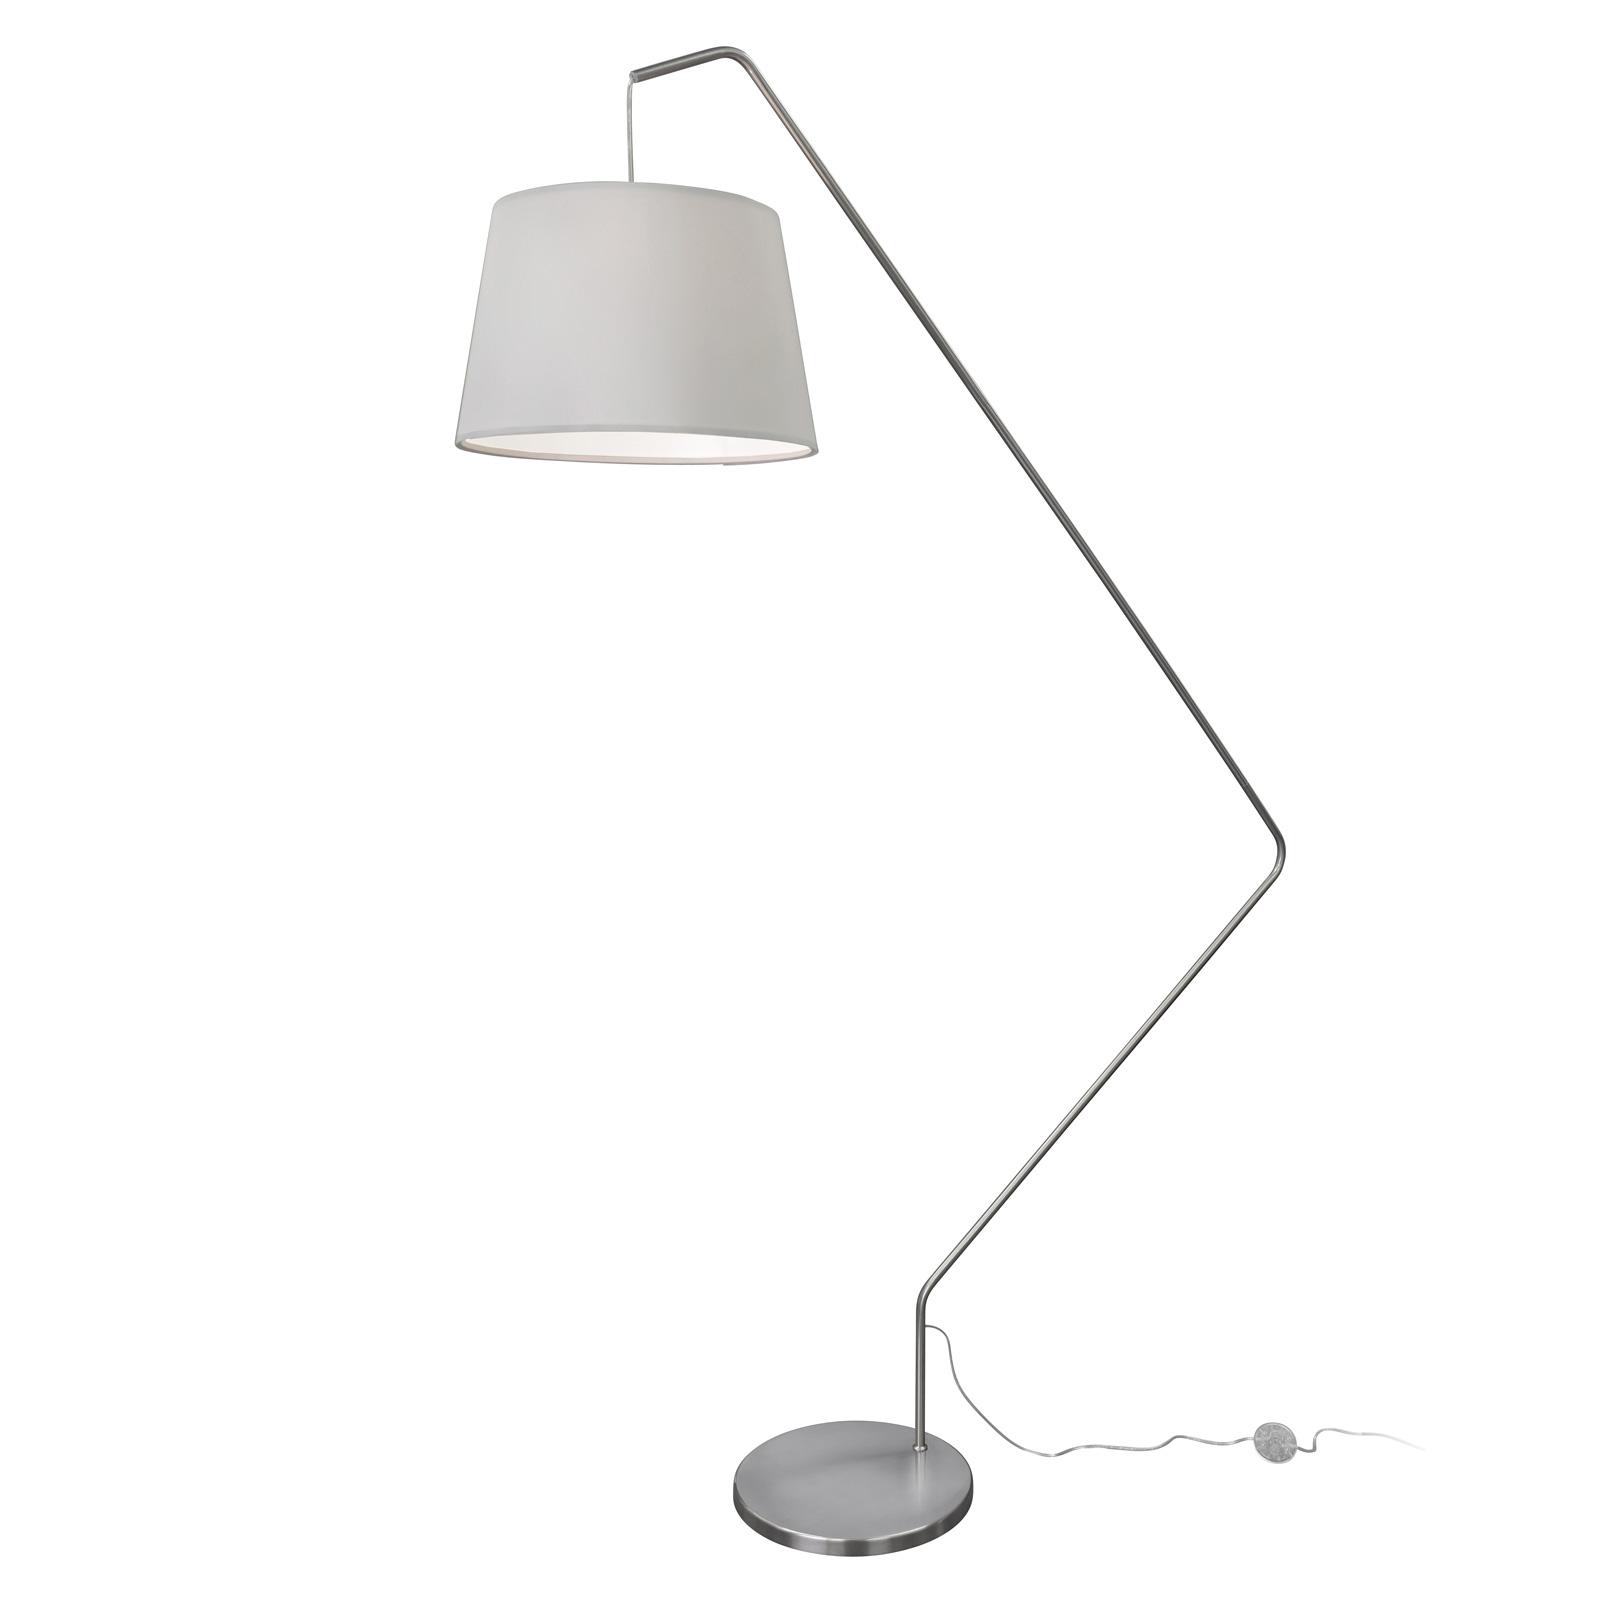 Villeroy & Boch Dublin lampadaire en blanc